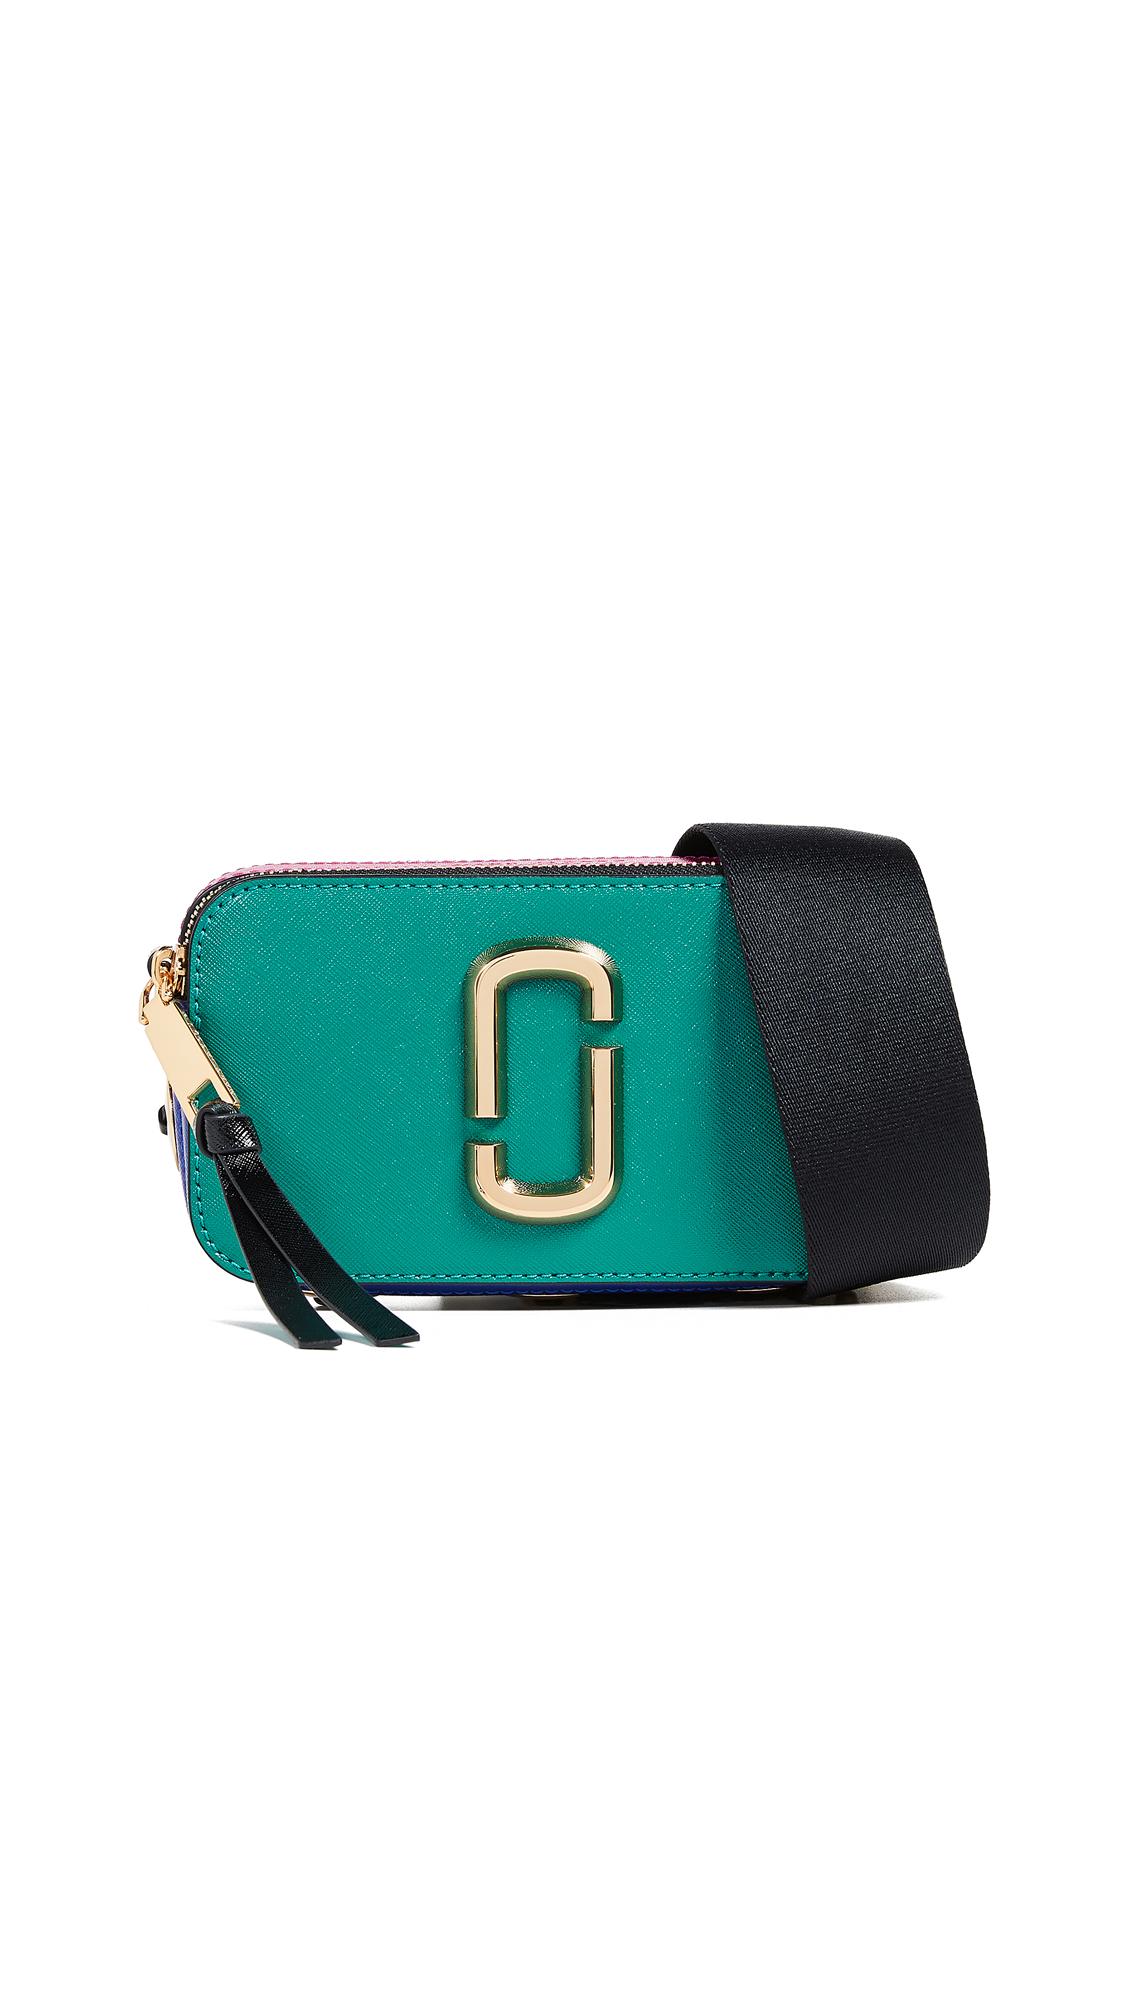 Marc Jacobs Snapshot Buttons Crossbody Bag - Arugula Multi